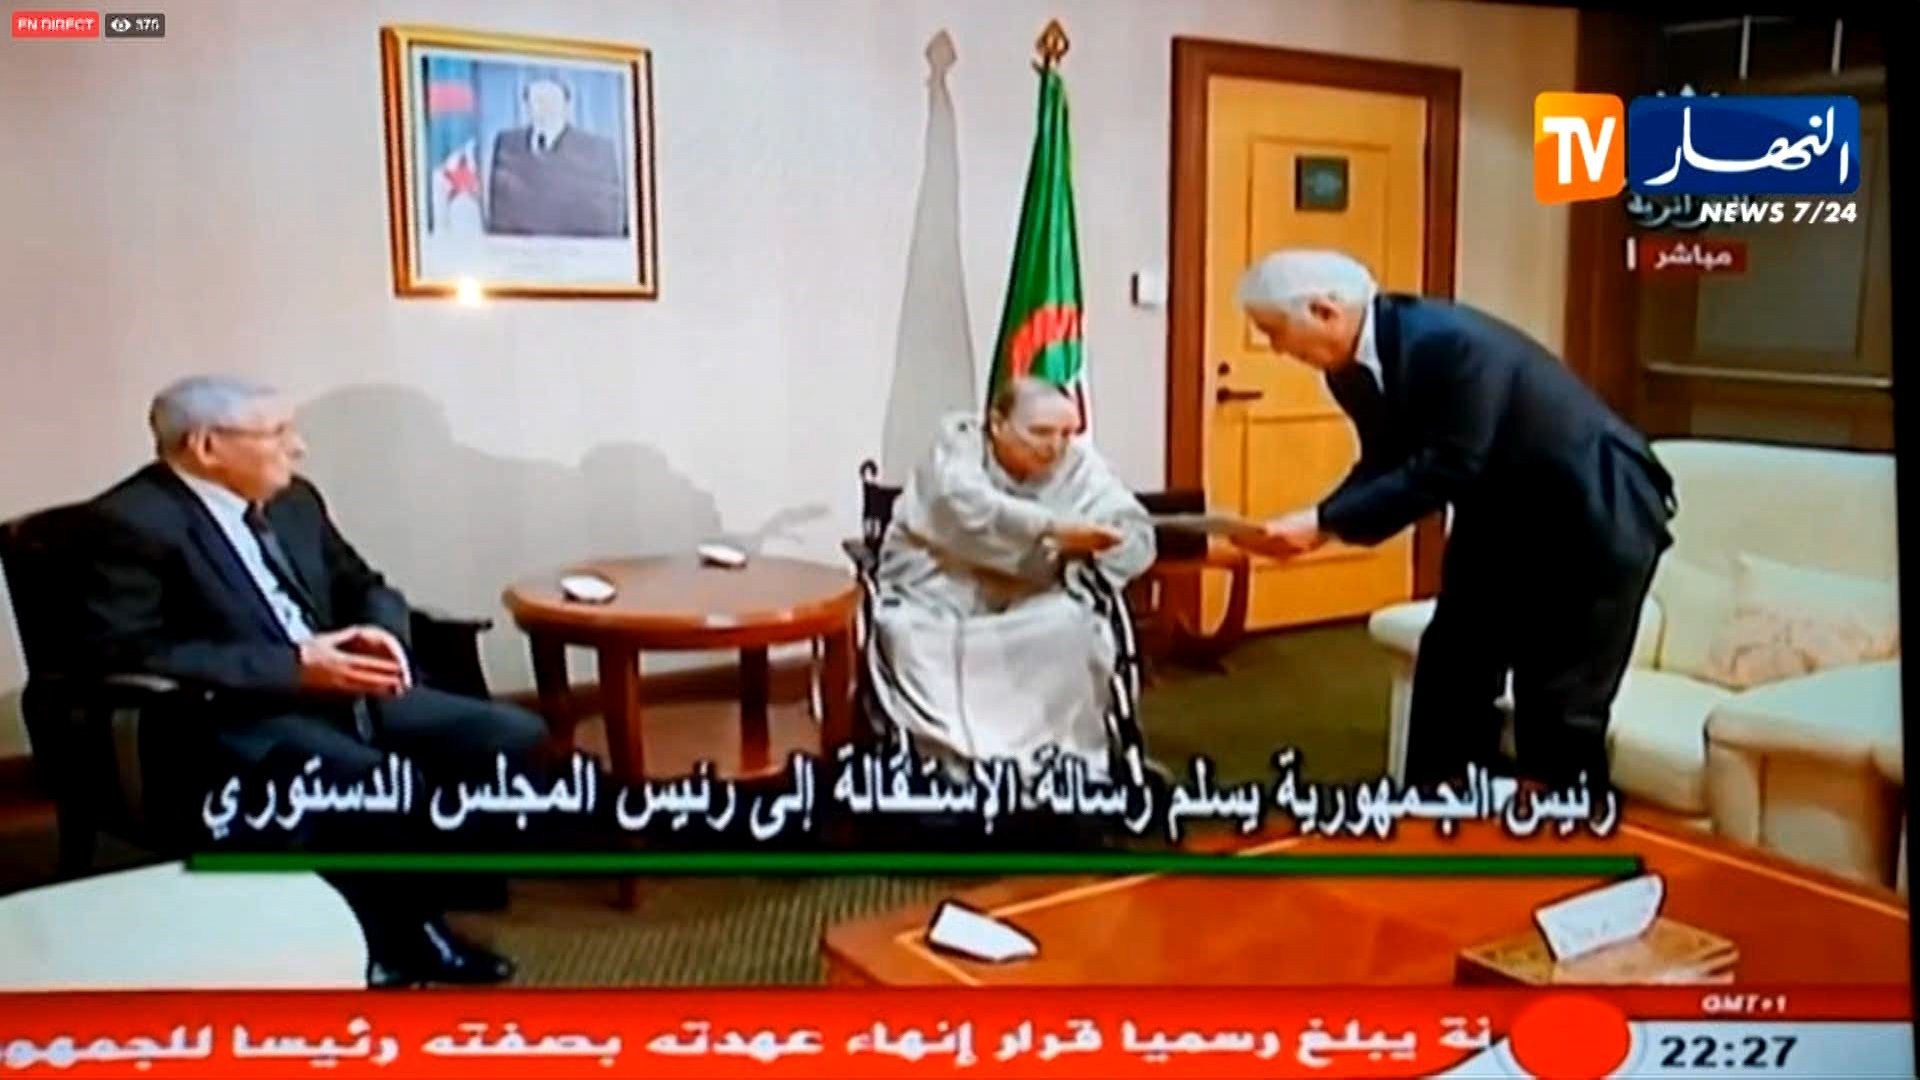 En Algérie, Bouteflika a